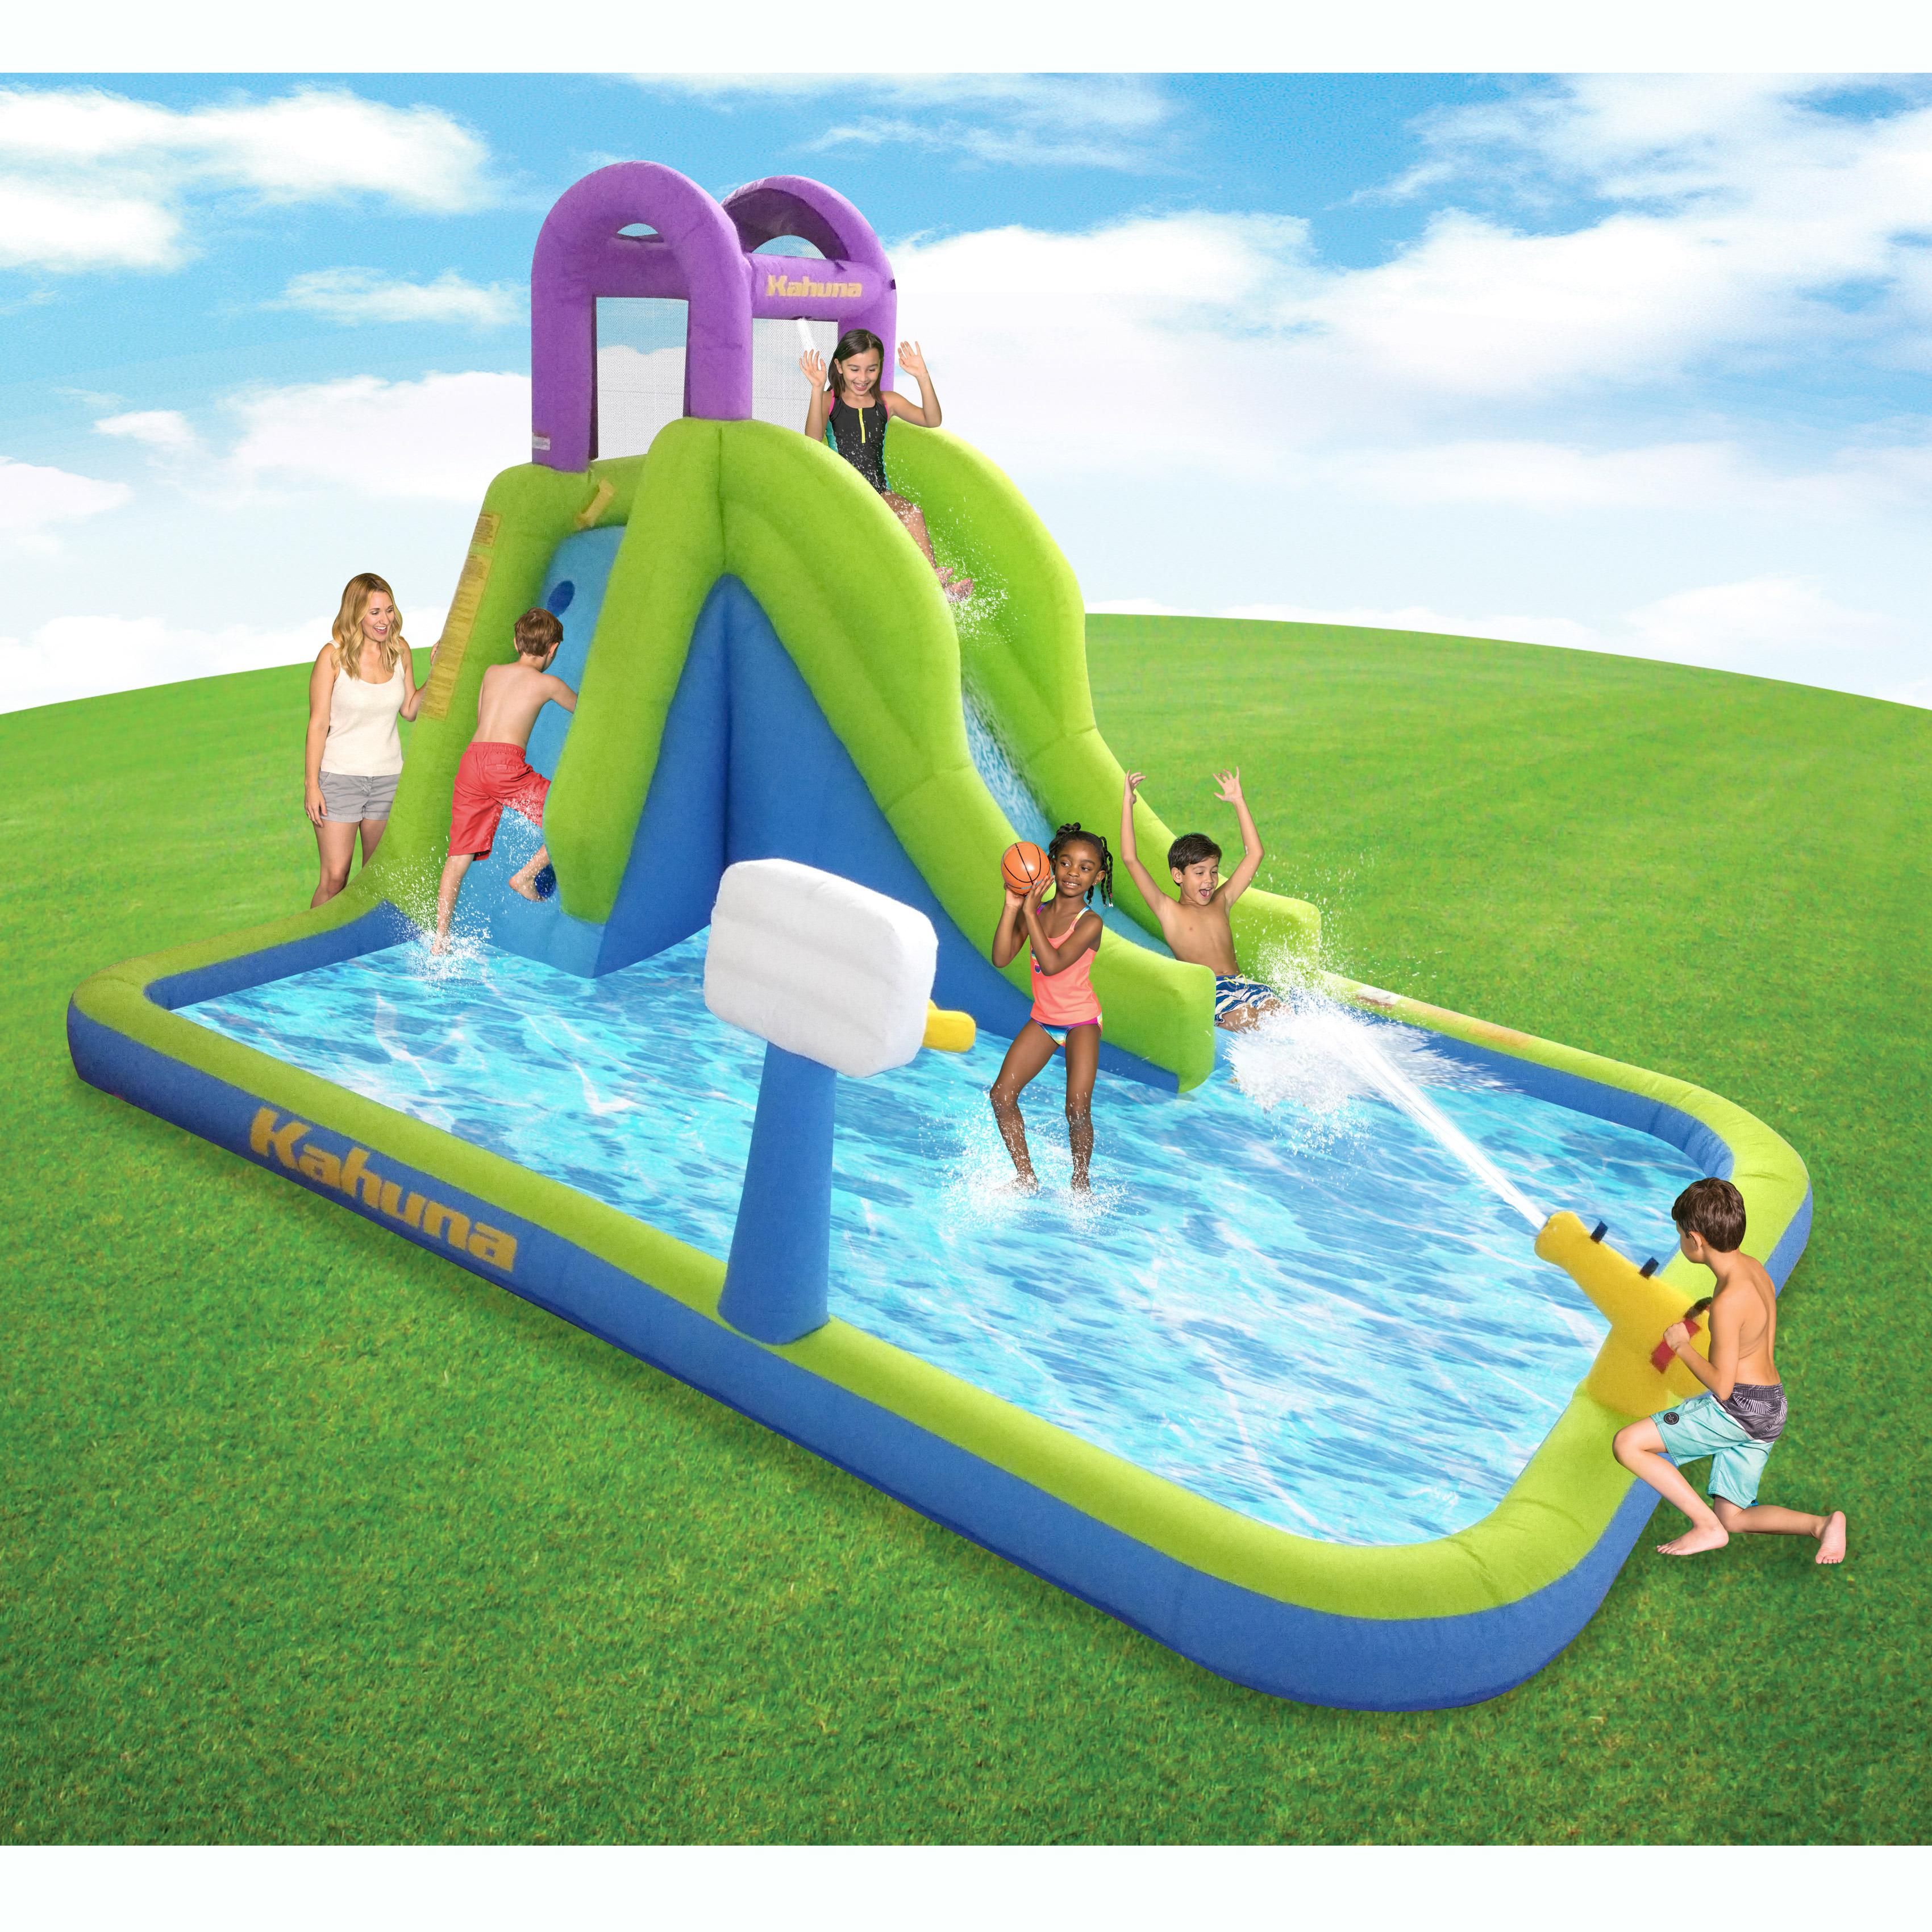 Backyard pool with slides Luxury Image Is Loading Kahunatornadotowerinflatableoutdoorbackyardkiddie Pool Ebay Kahuna Tornado Tower Inflatable Outdoor Backyard Kiddie Pool Slide